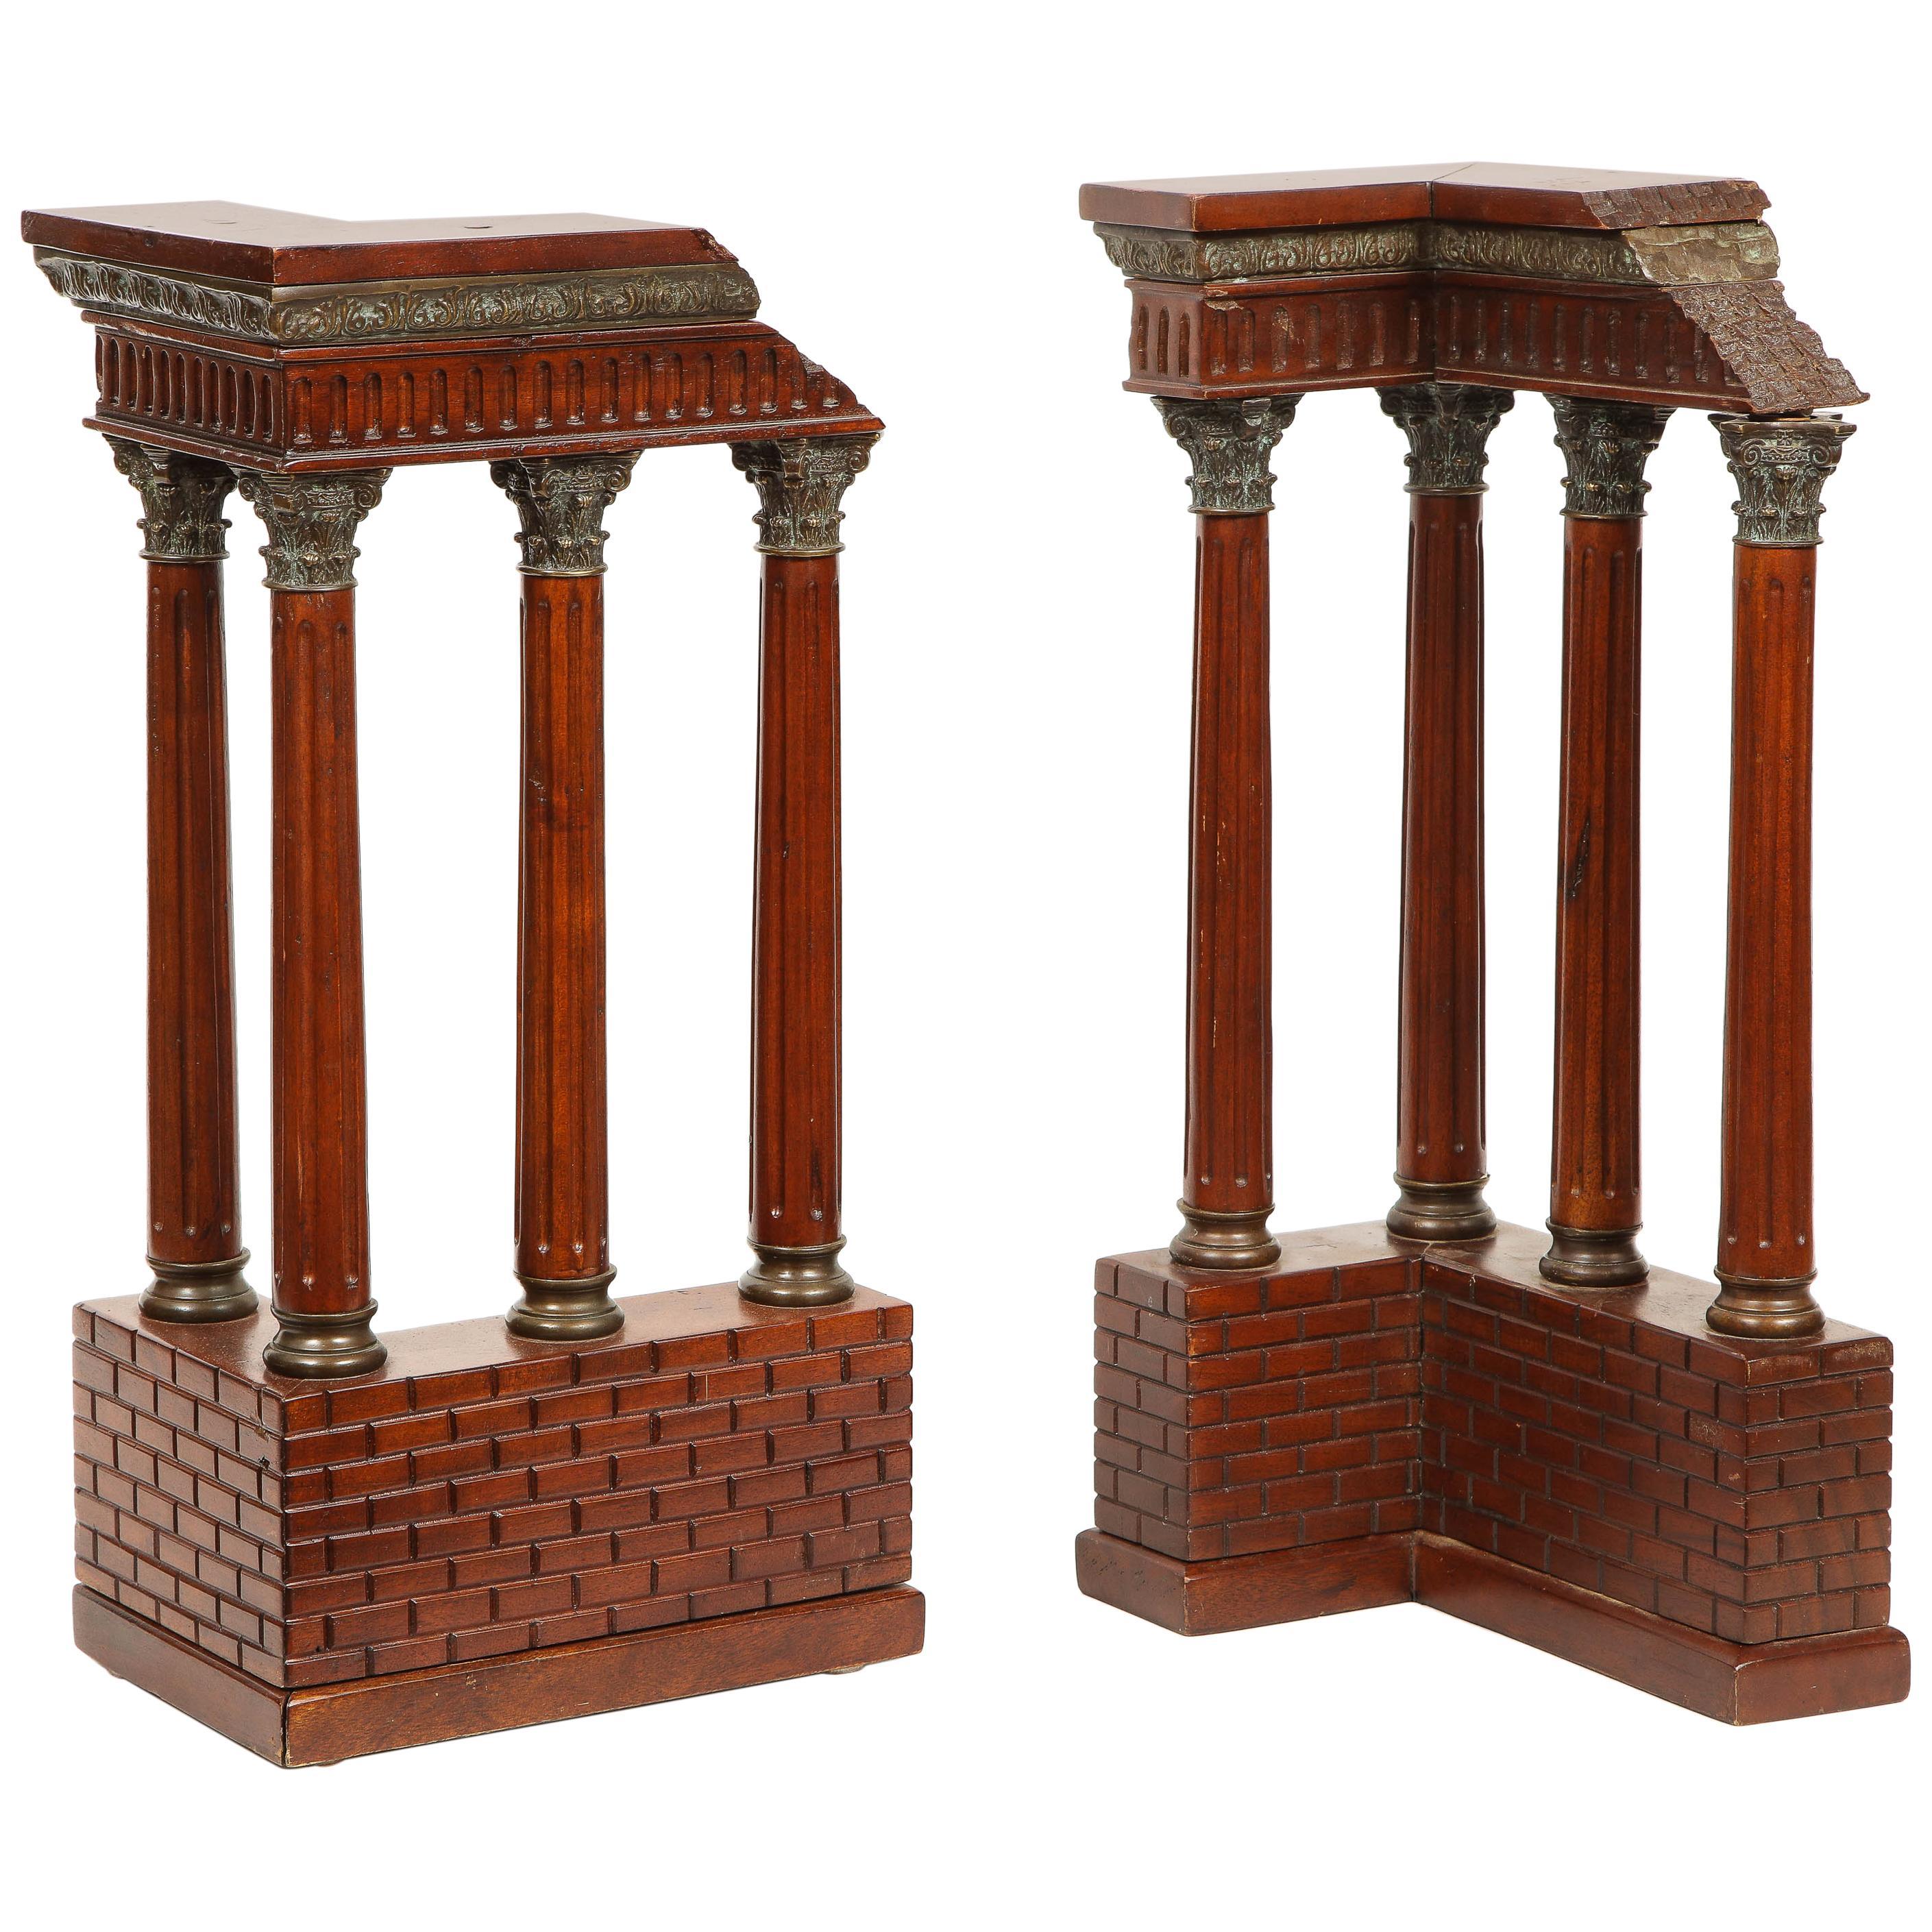 Pair of Italian Grand Tour Mahogany Wood & Bronze Roman Ruins Neoclassical Model